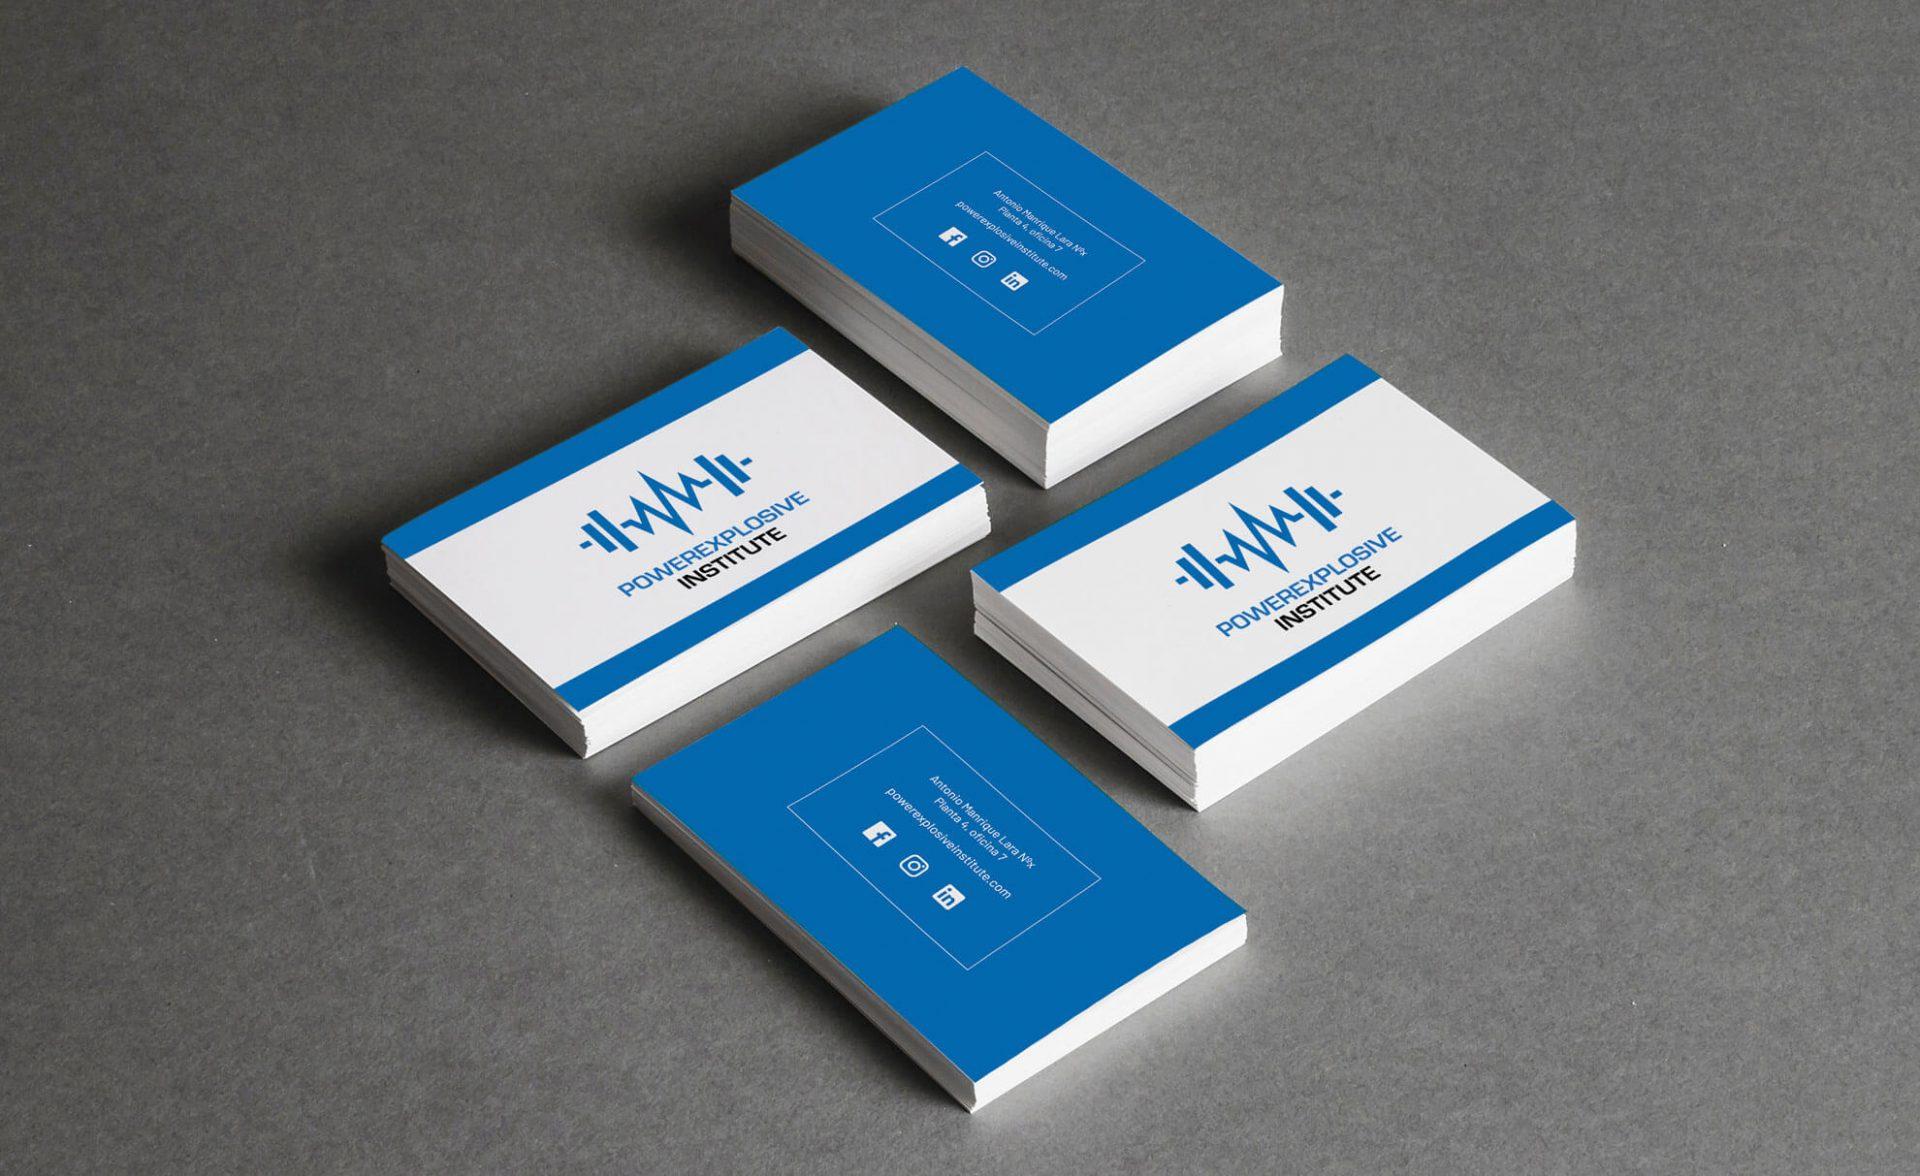 Merchandising tarjetas corporativas portfolio diseño powerexplosive institute